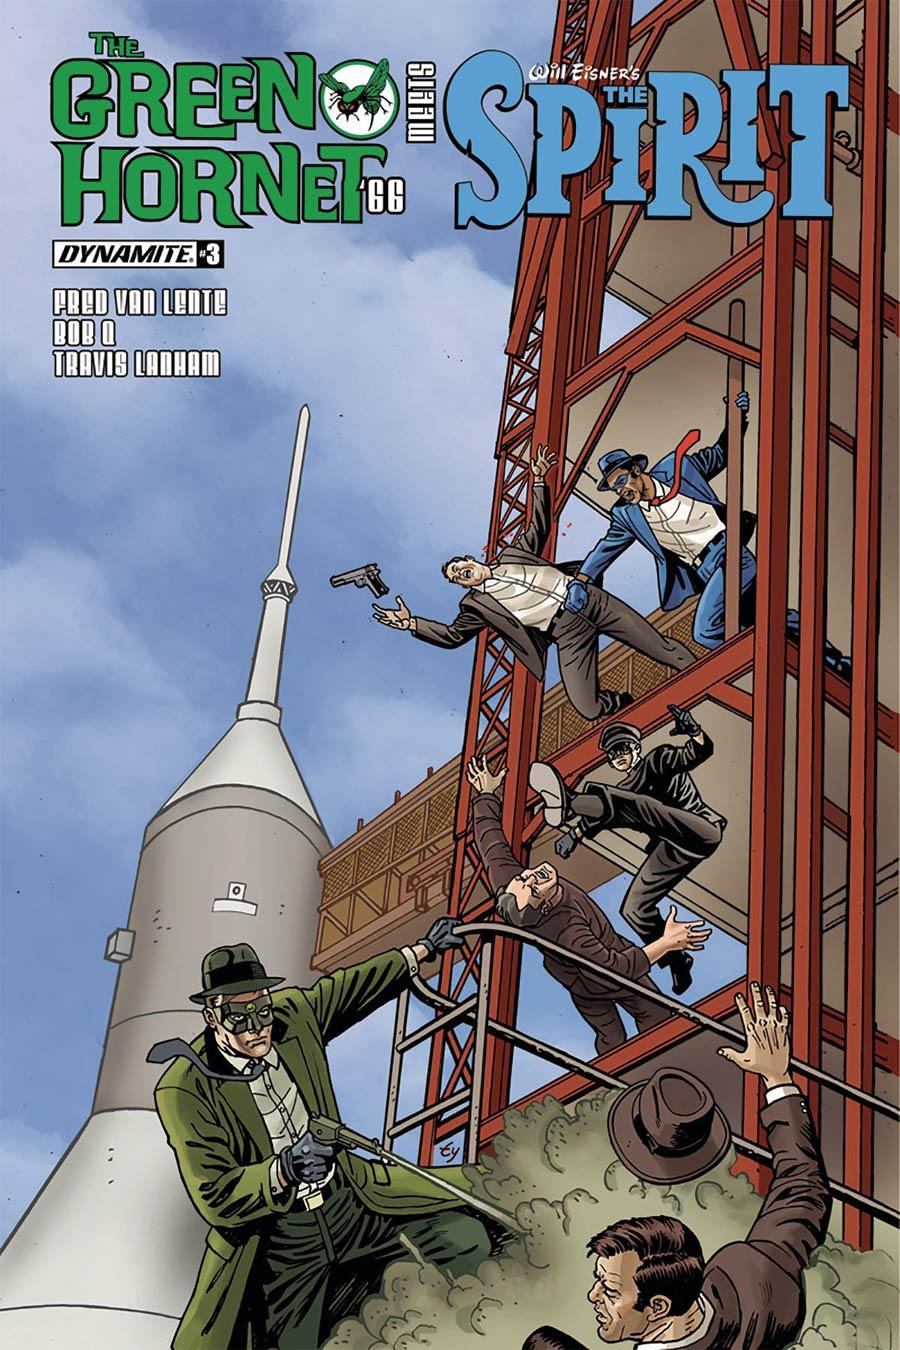 Green Hornet 66 Meets The Spirit #3 Cover A Regular Ty Templeton Cover